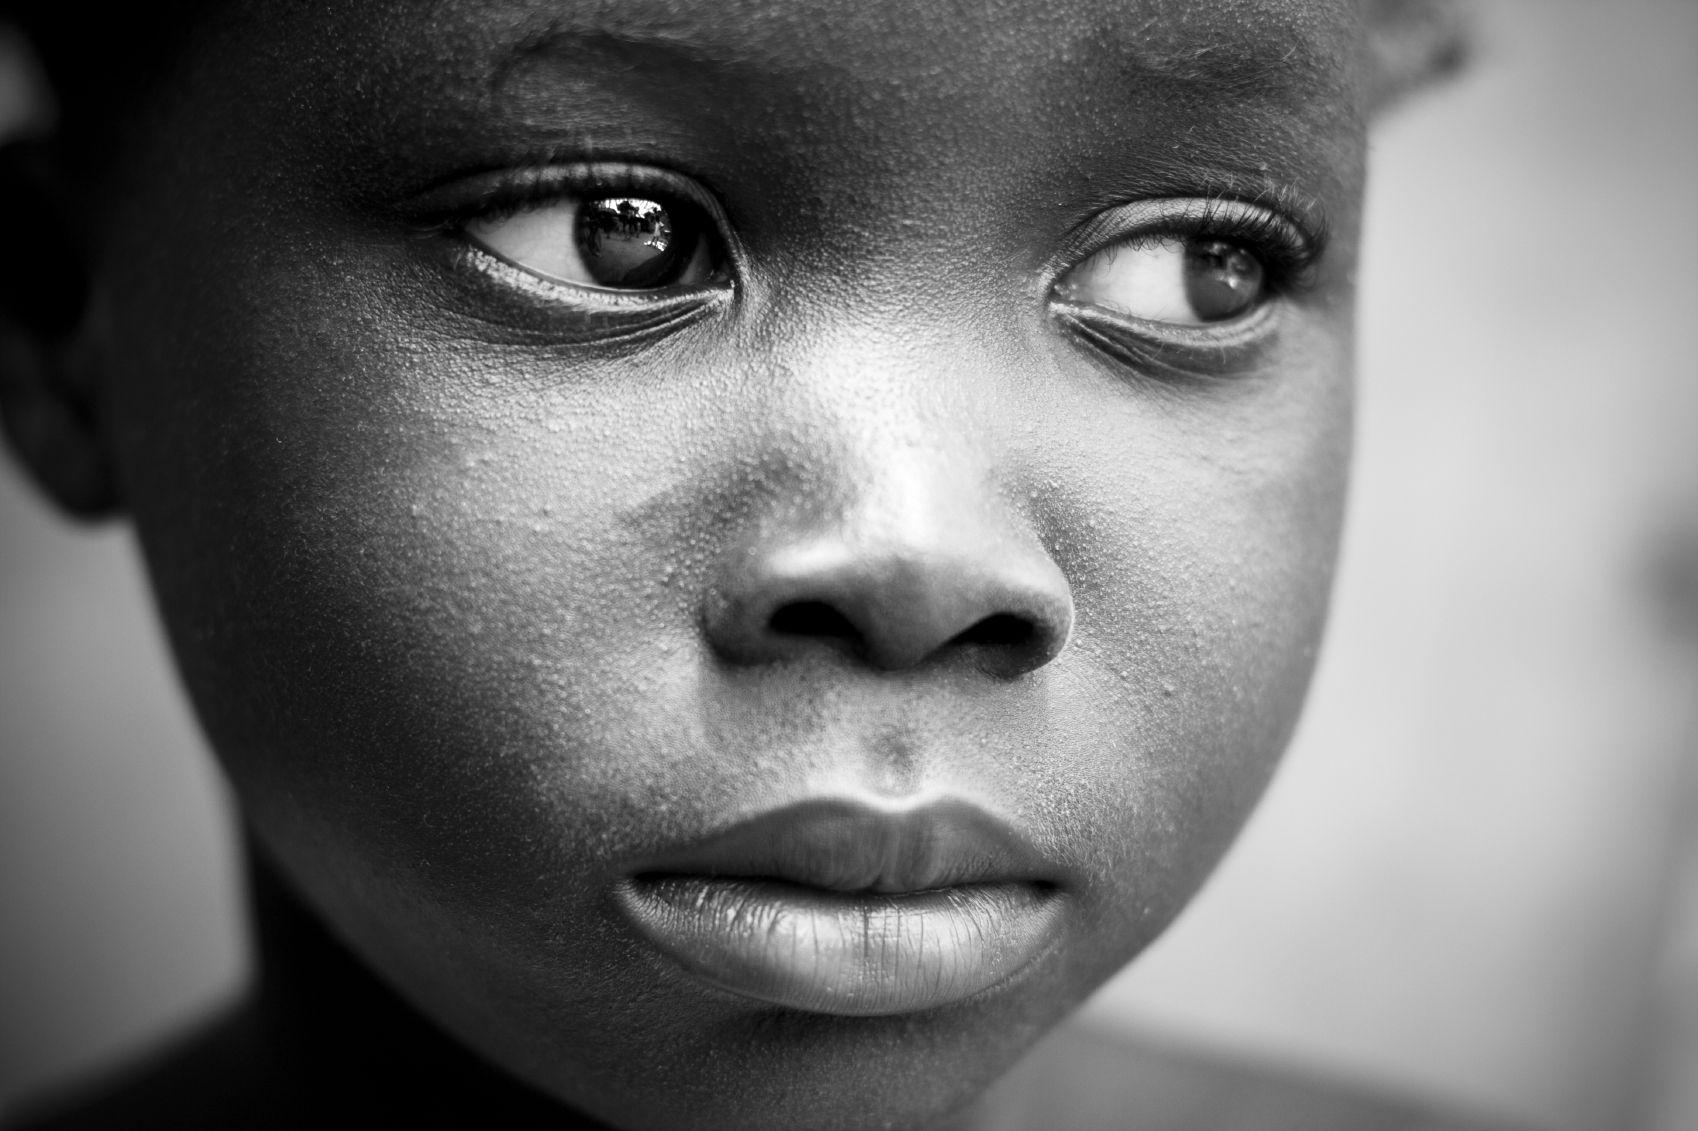 Sad African Children | BLACK beauty | Pinterest | African ...